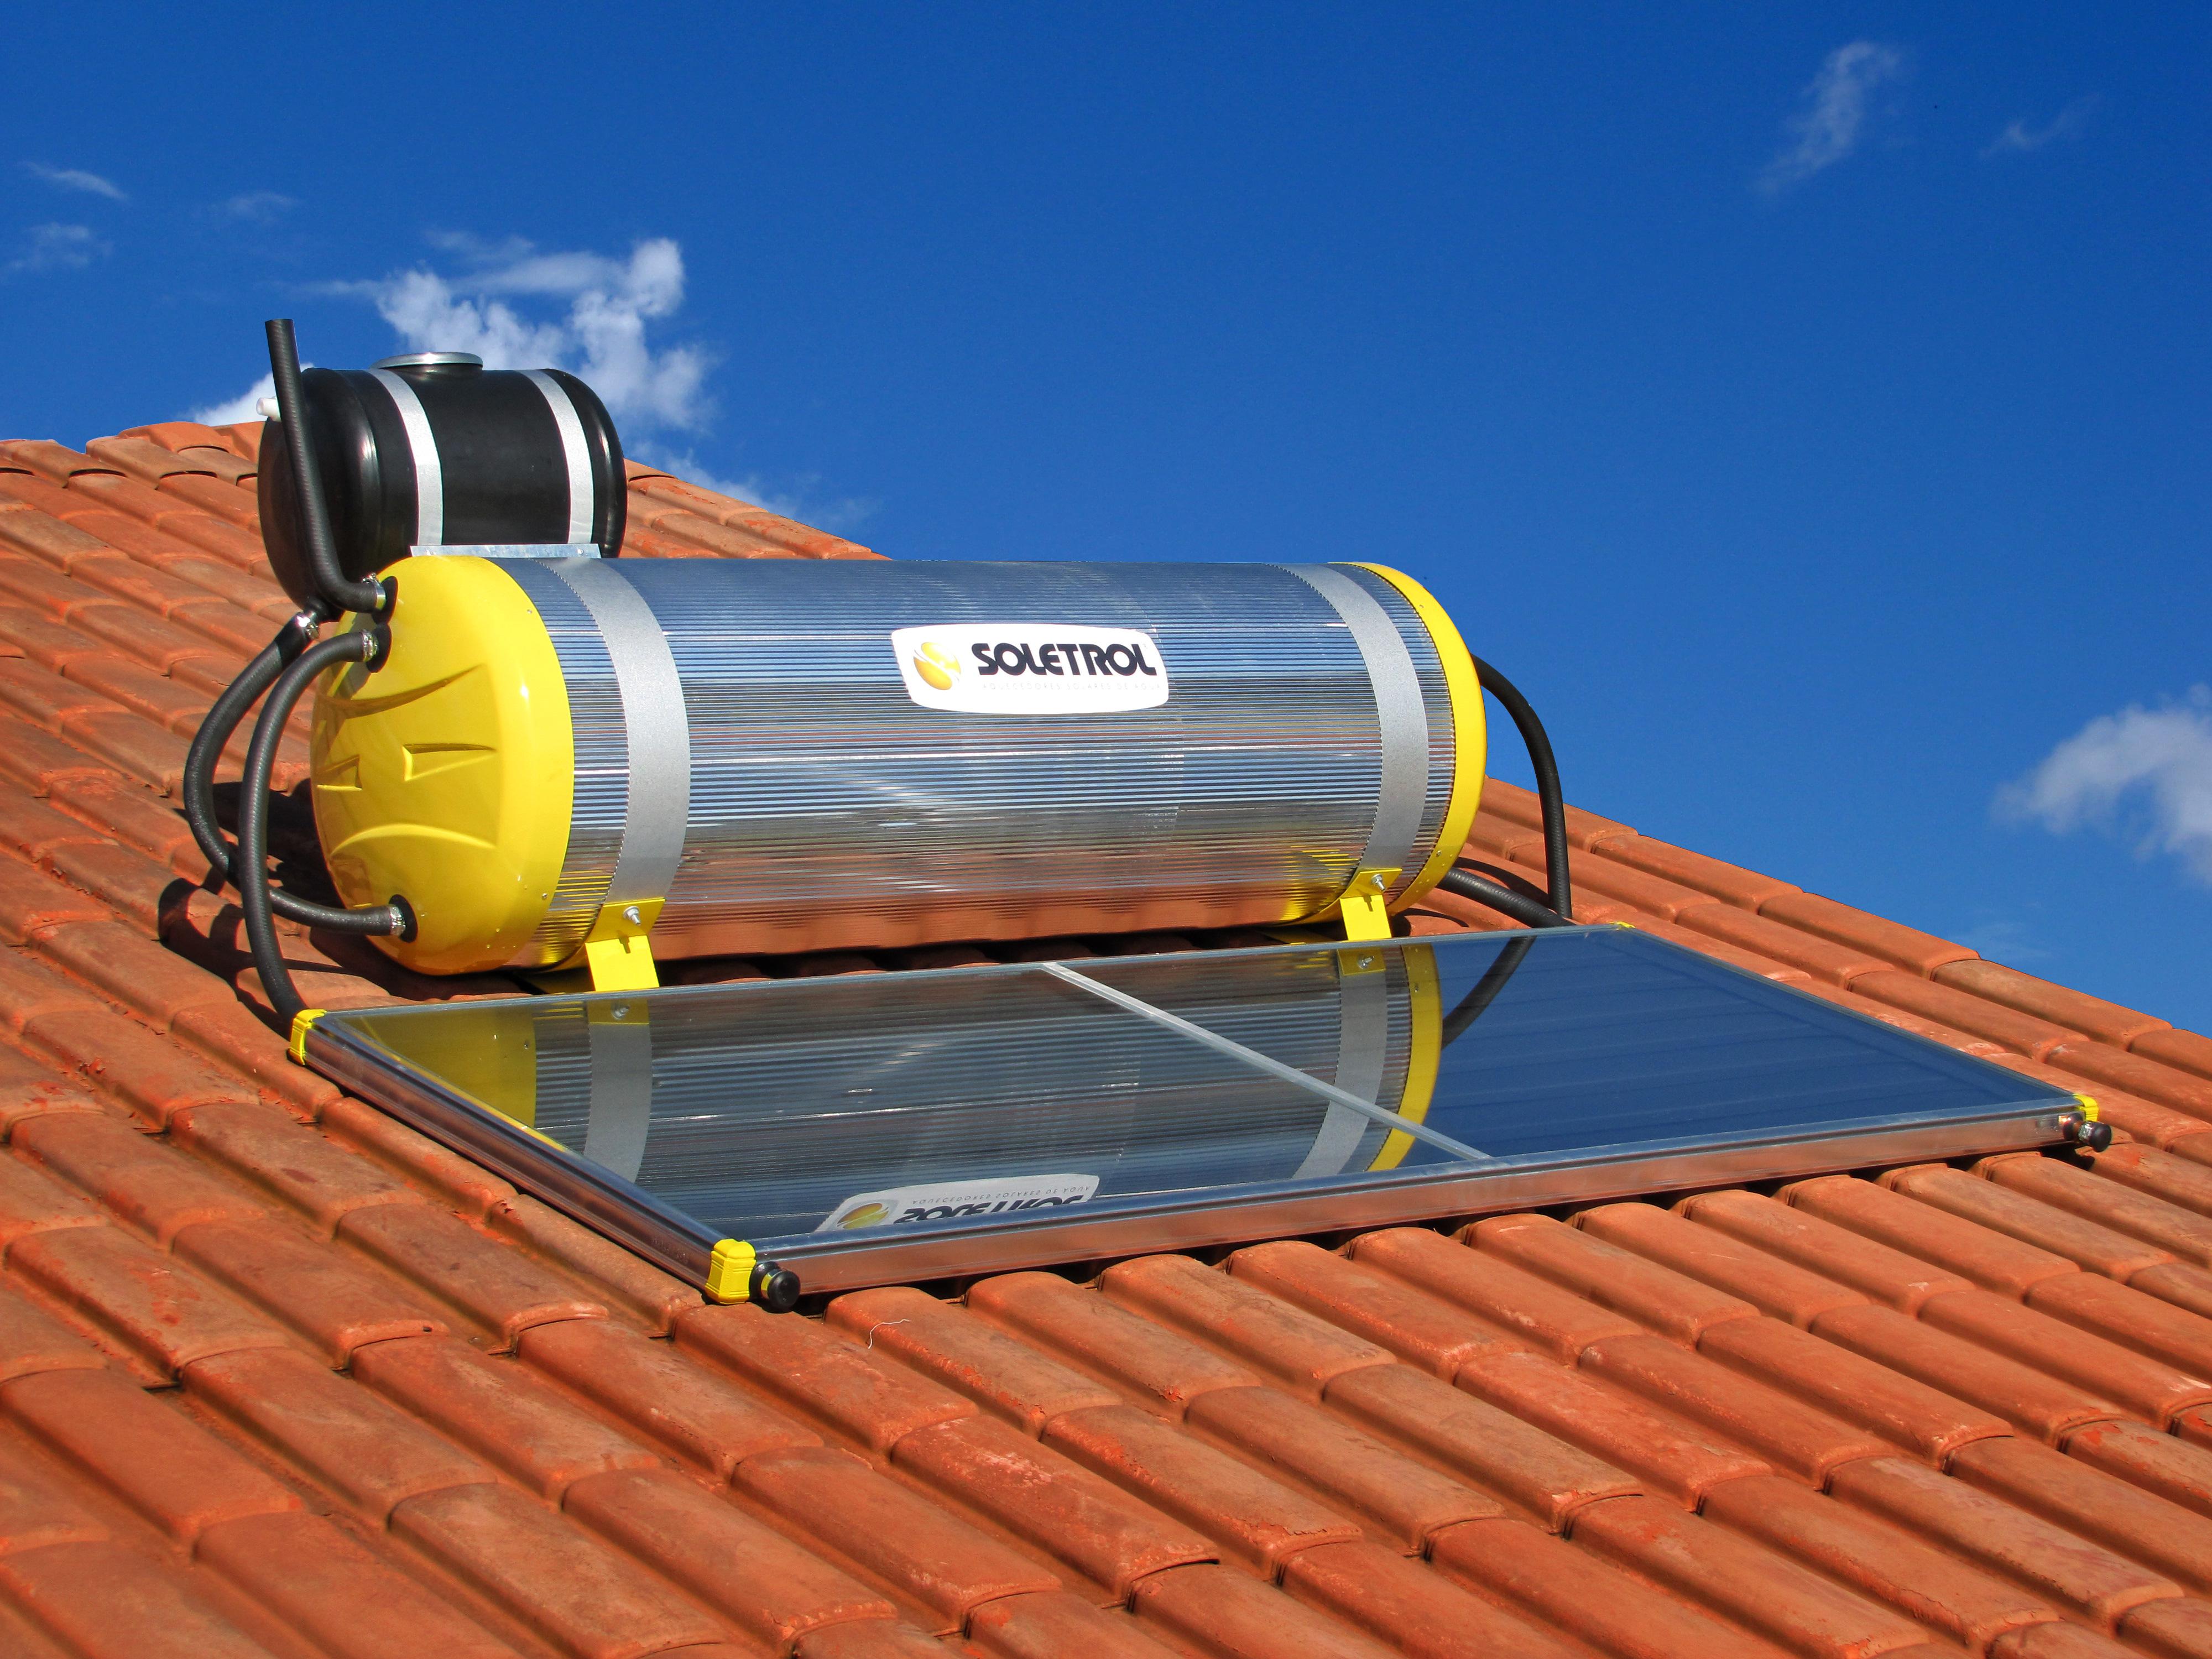 Aquecedor Solar Compacto Soletrol Special